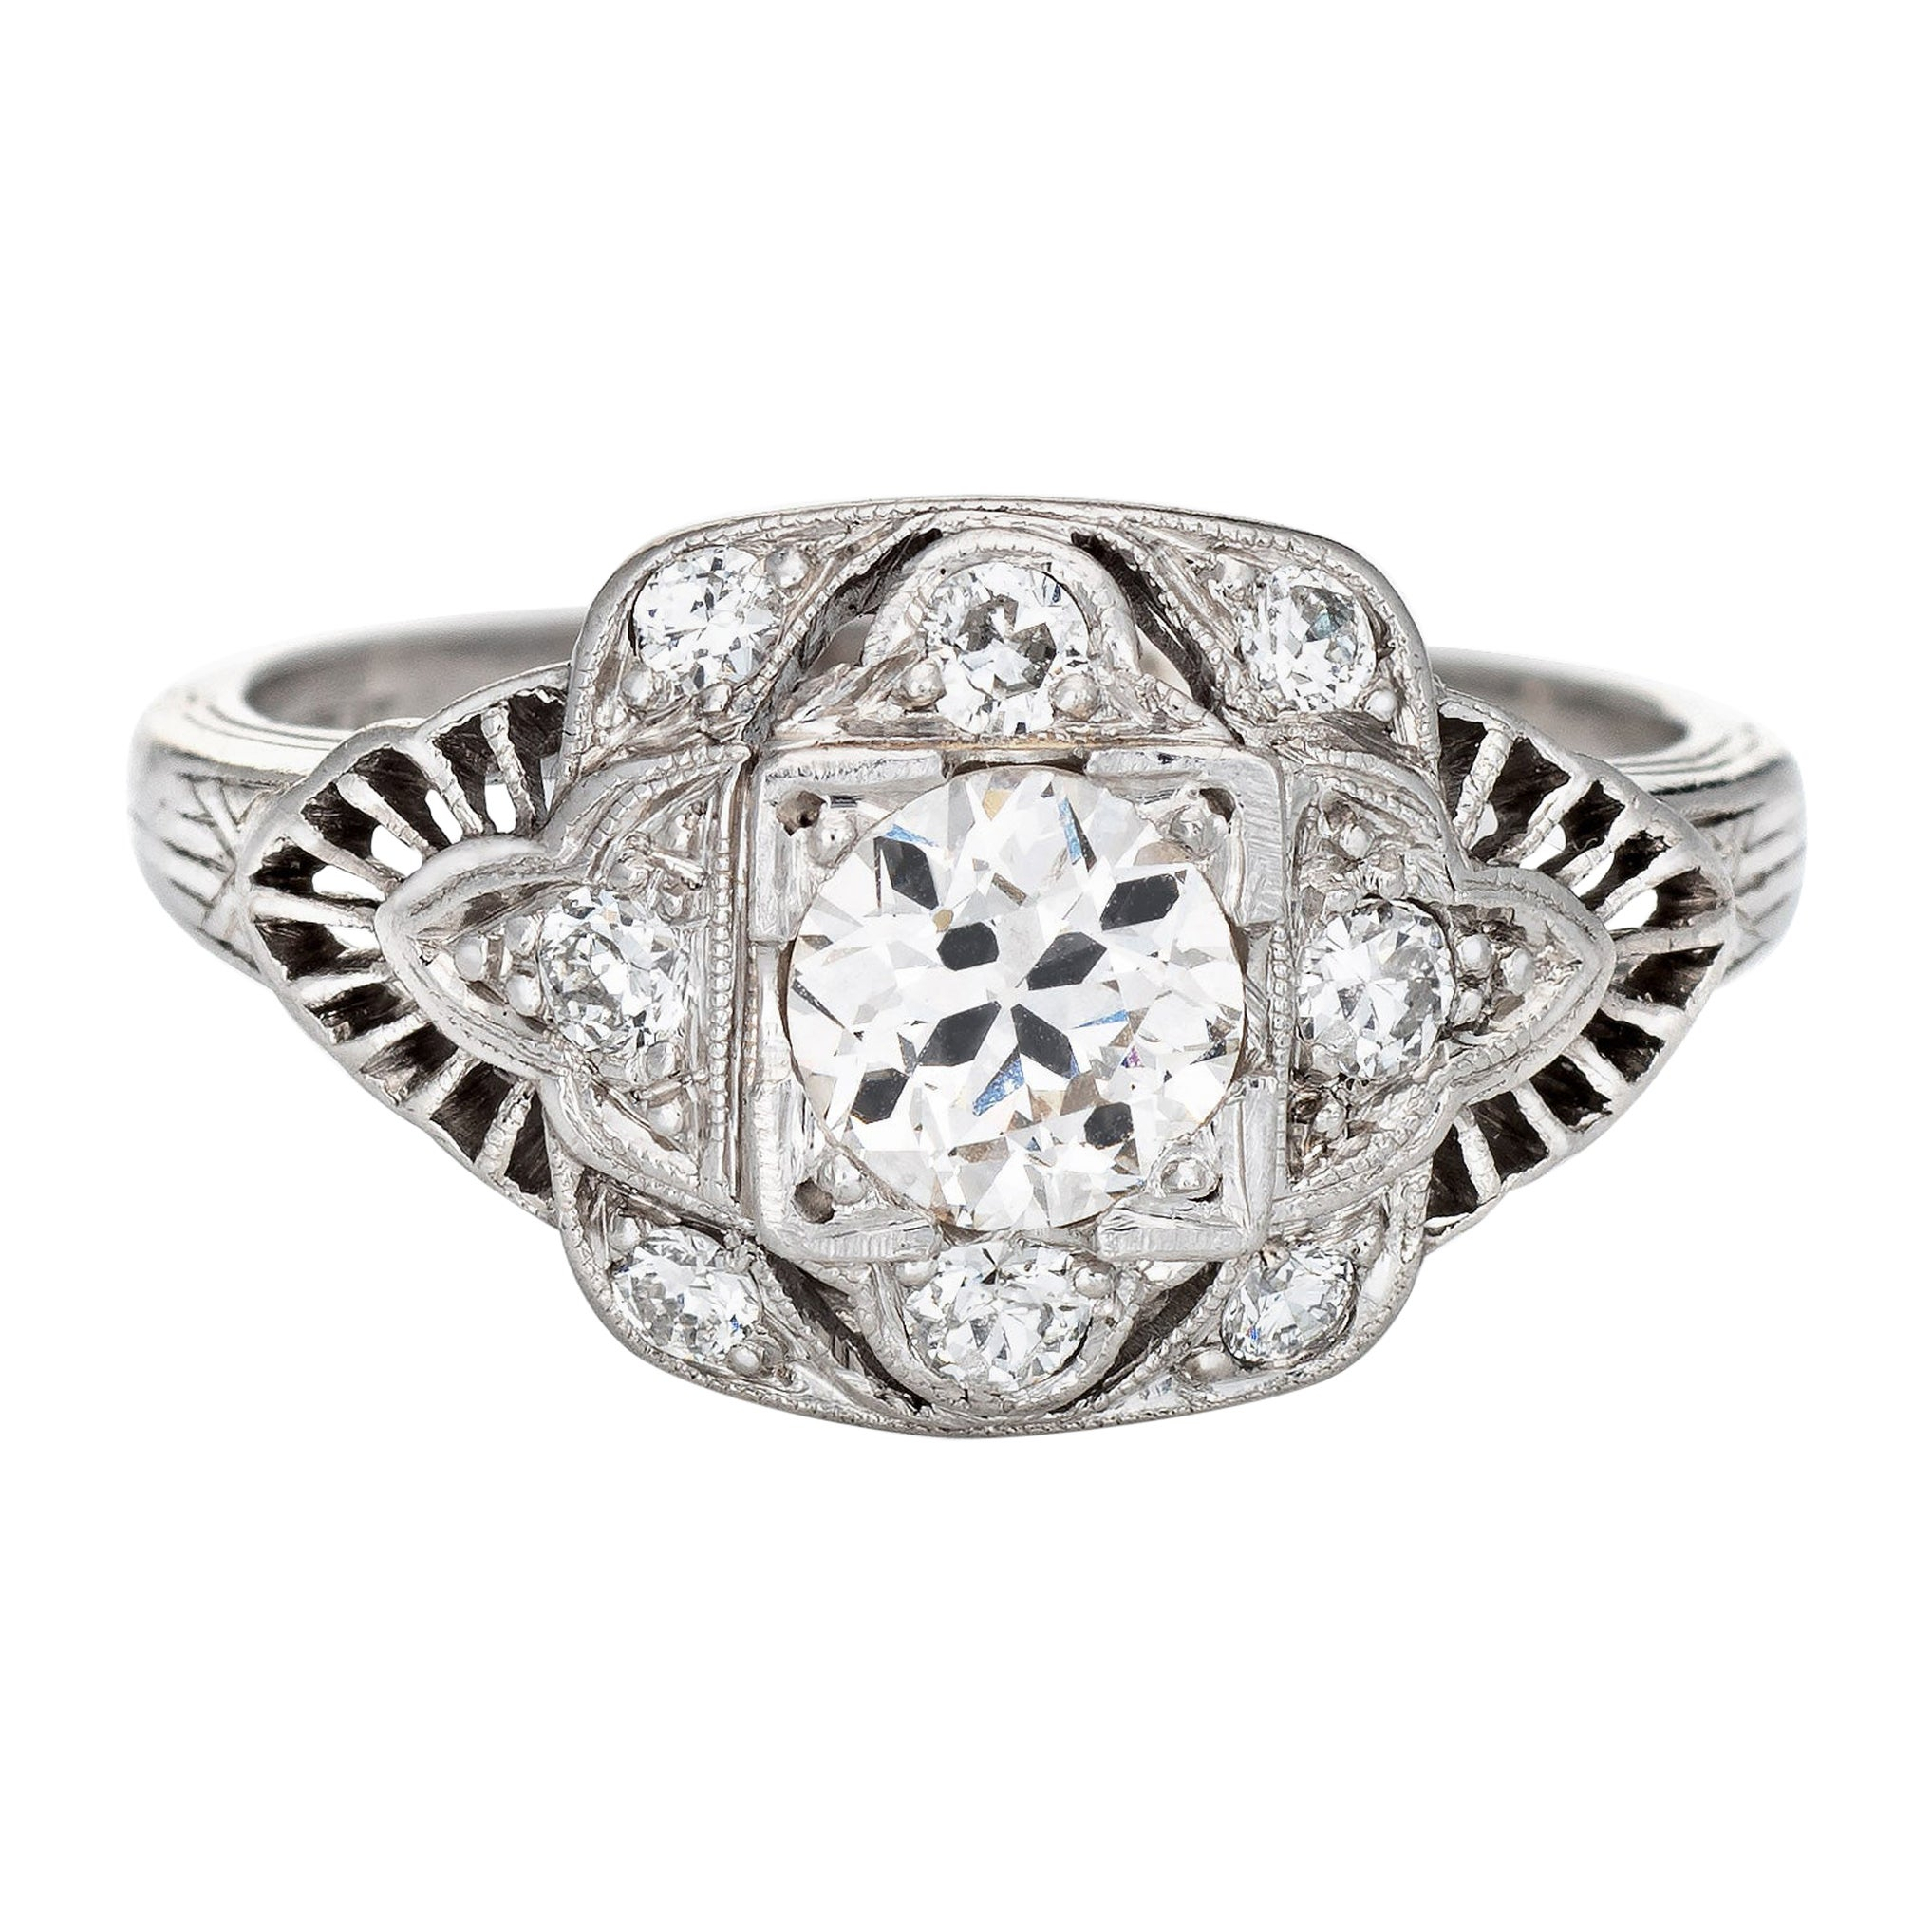 Vintage Art Deco 0.57ct Diamond Ring GIA Platinum Engagement Estate Jewelry